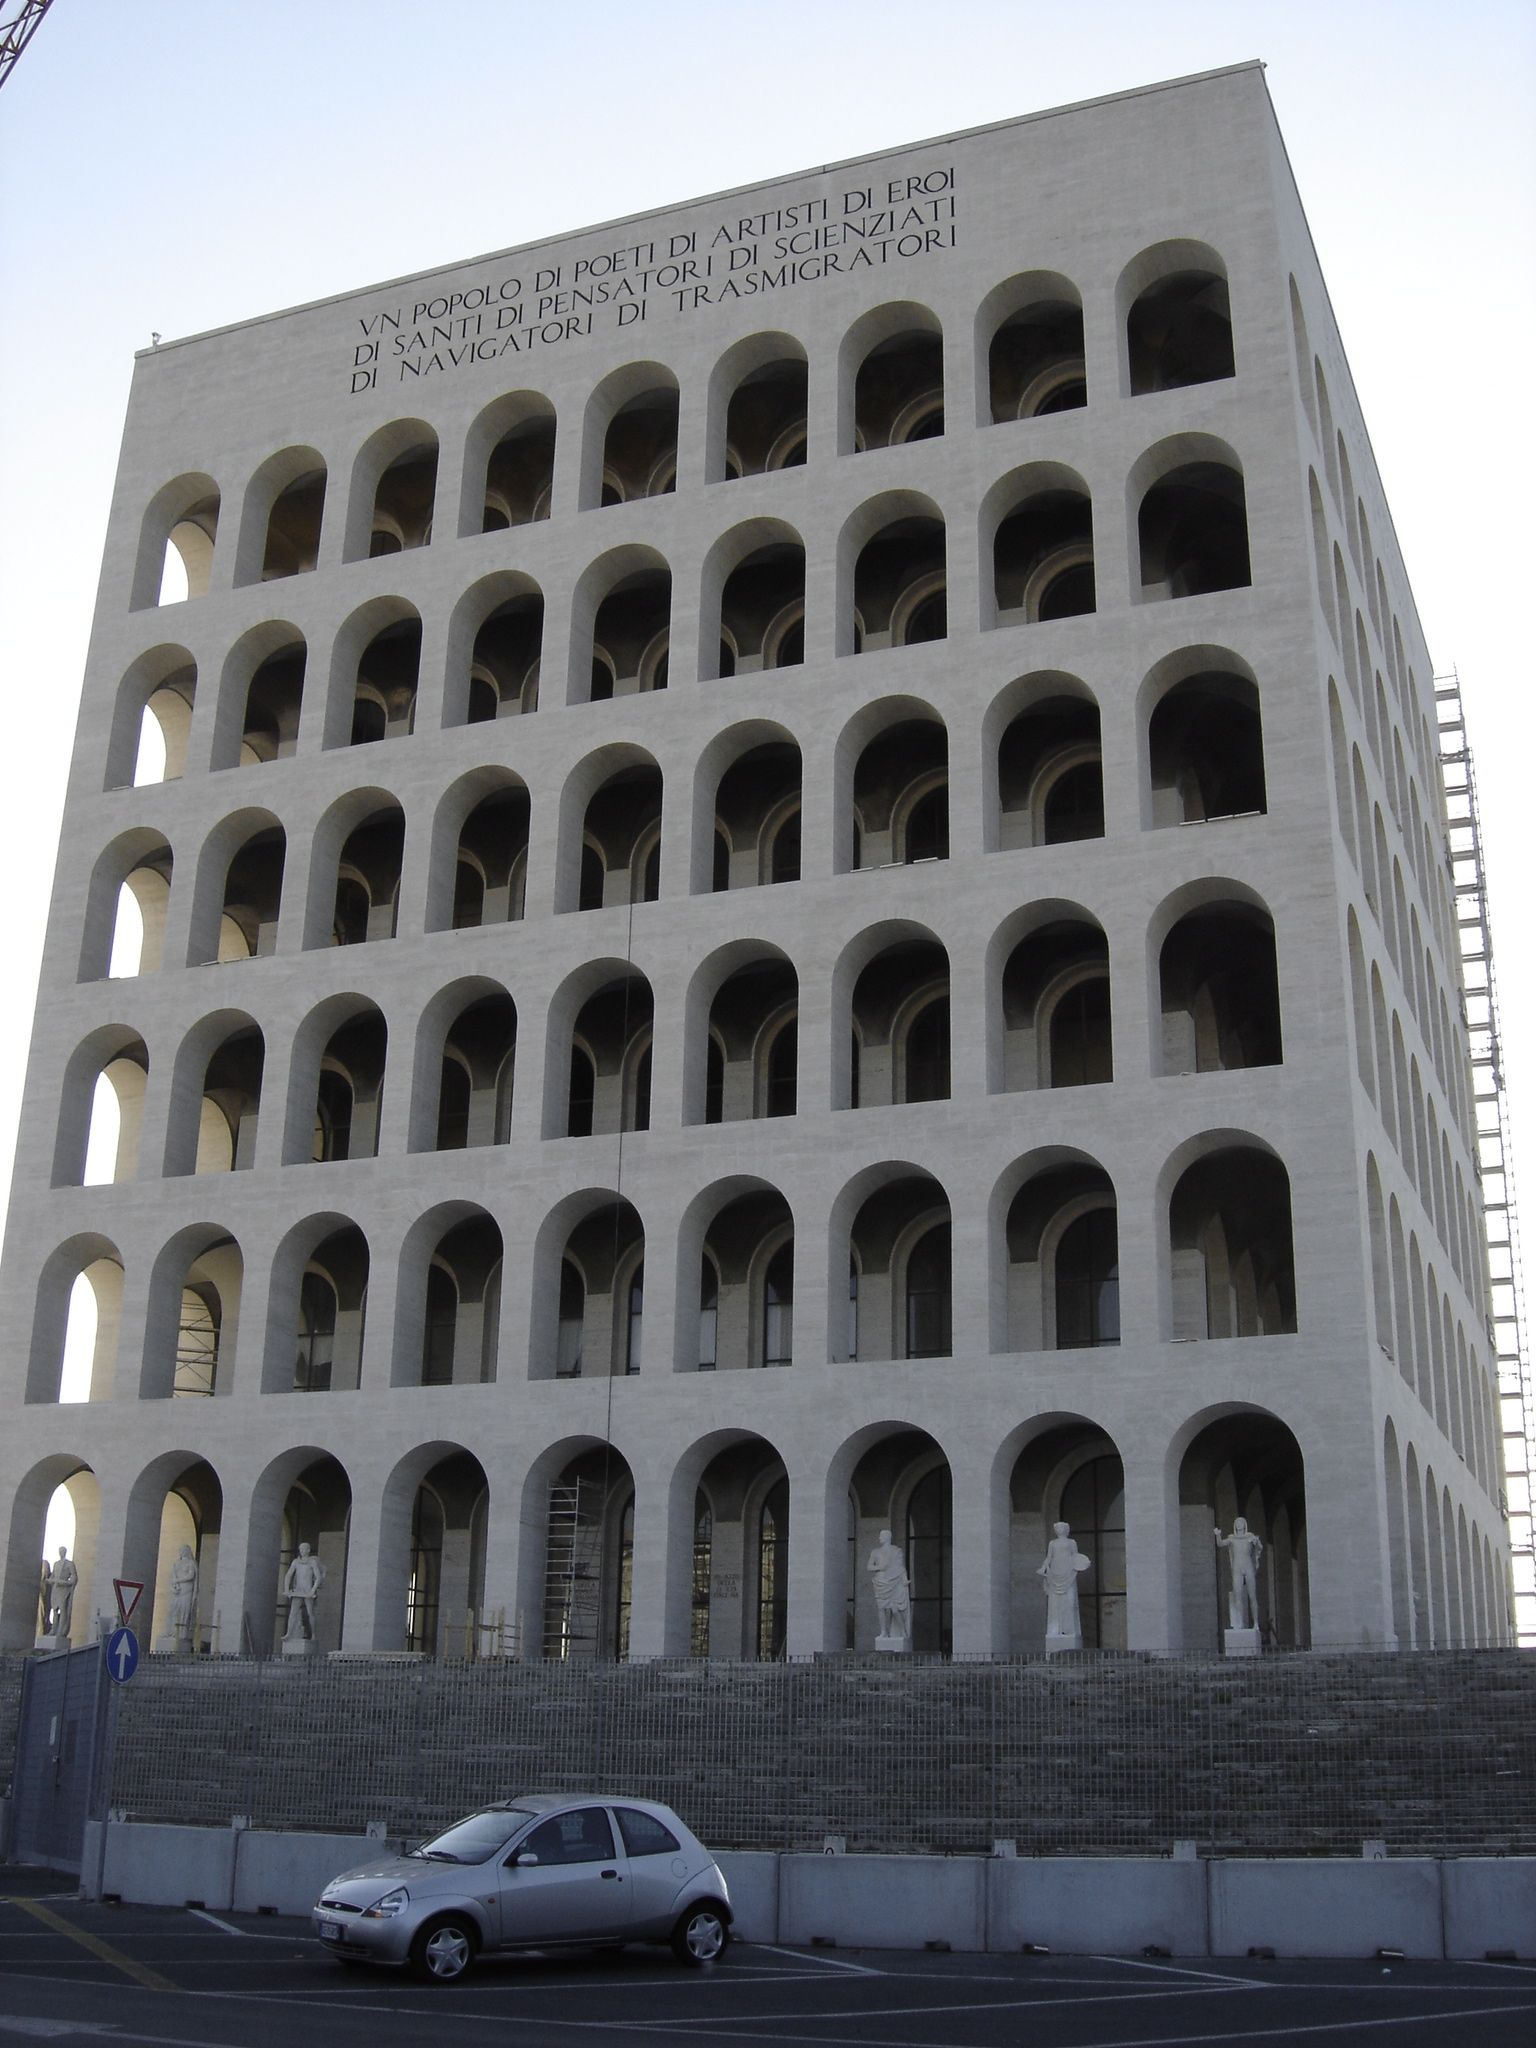 Adalberto Libera Fascist Architecture Architecture Images Ancient Roman Architecture